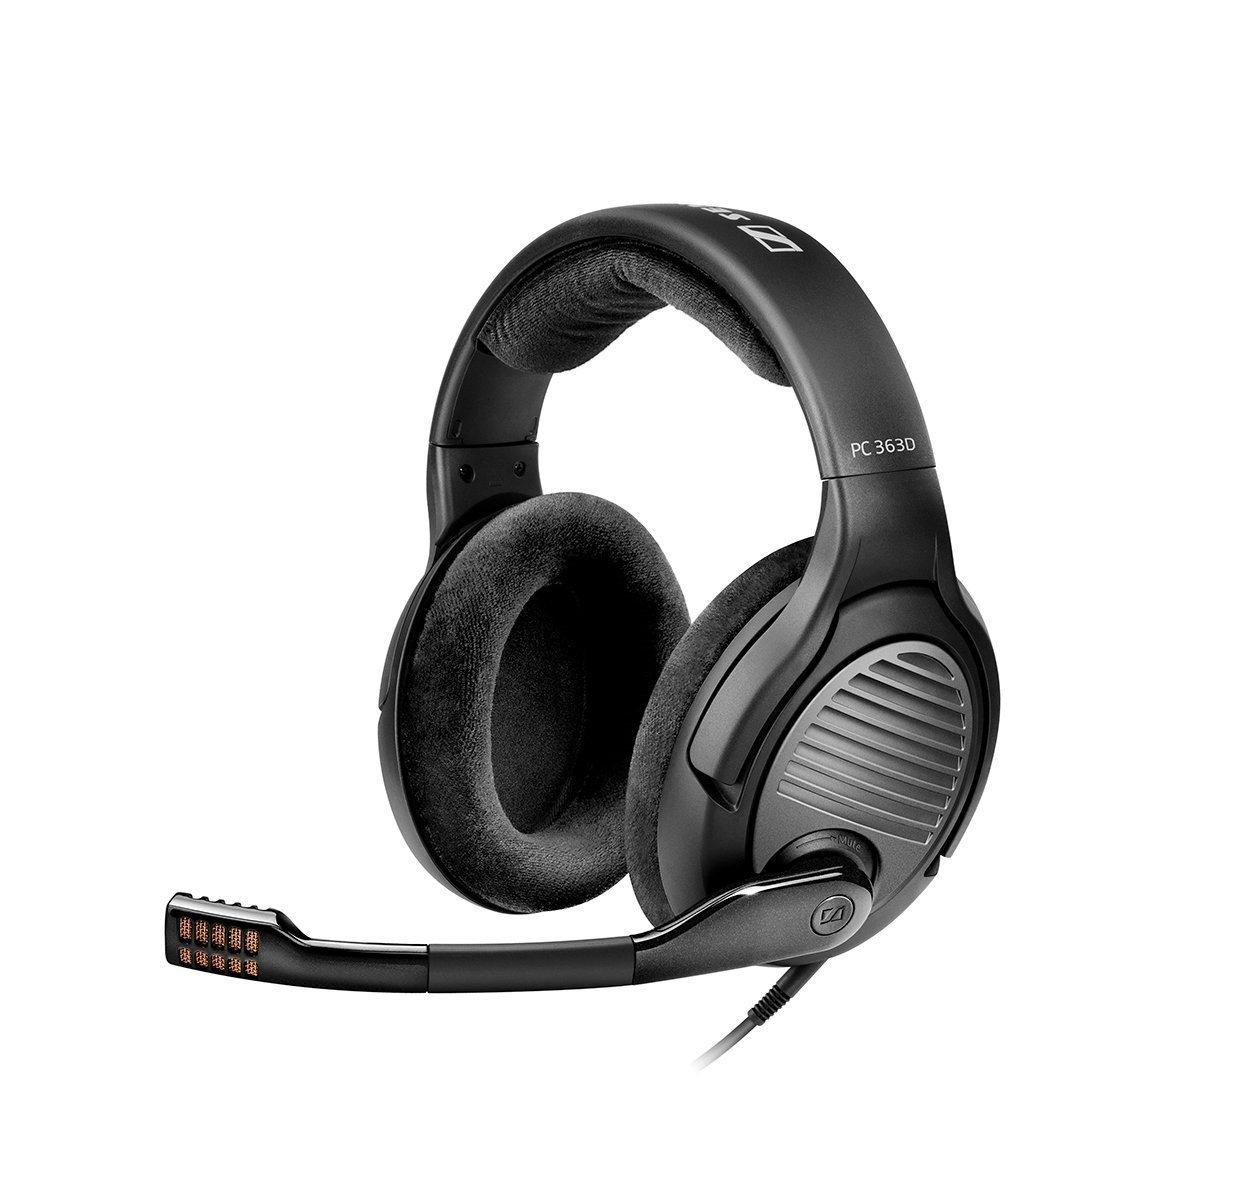 Sennheiser PC 363D – Mejores auriculares gaming